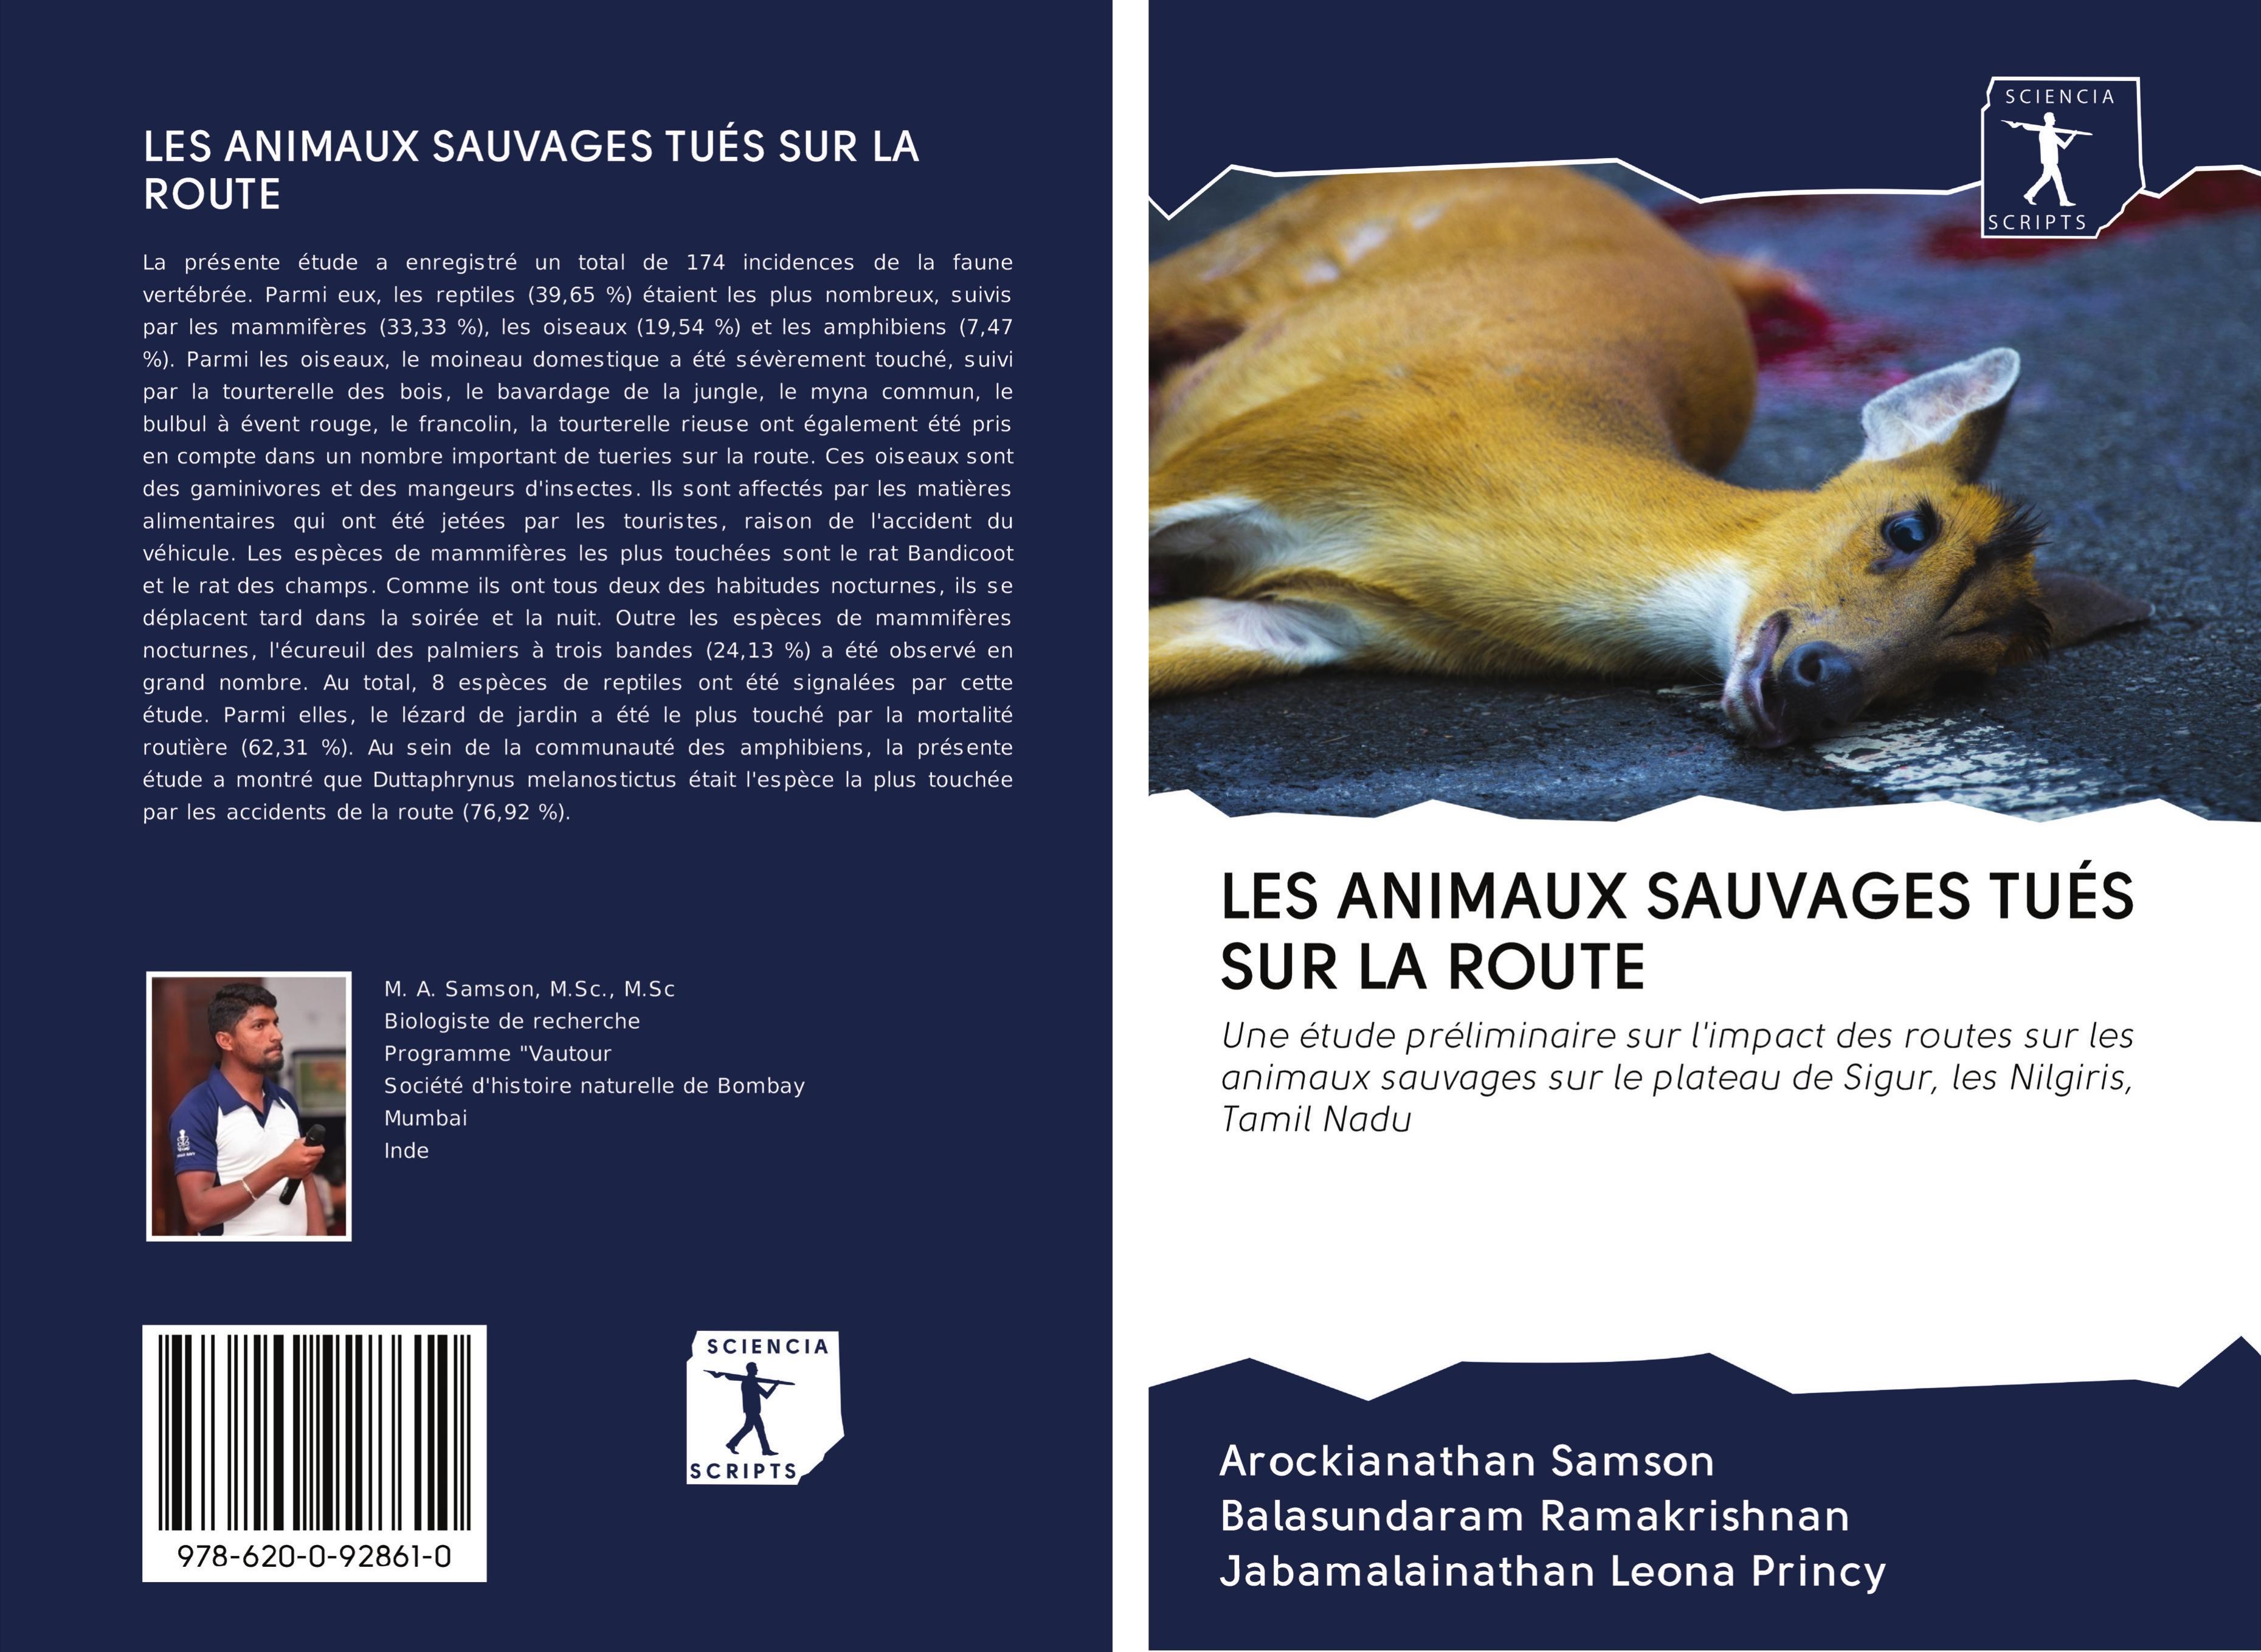 LES ANIMAUX SAUVAGES TUÉS SUR LA ROUTE - Samson, Arockianathan|Ramakrishnan, Balasundaram|Leona Princy, Jabamalainathan